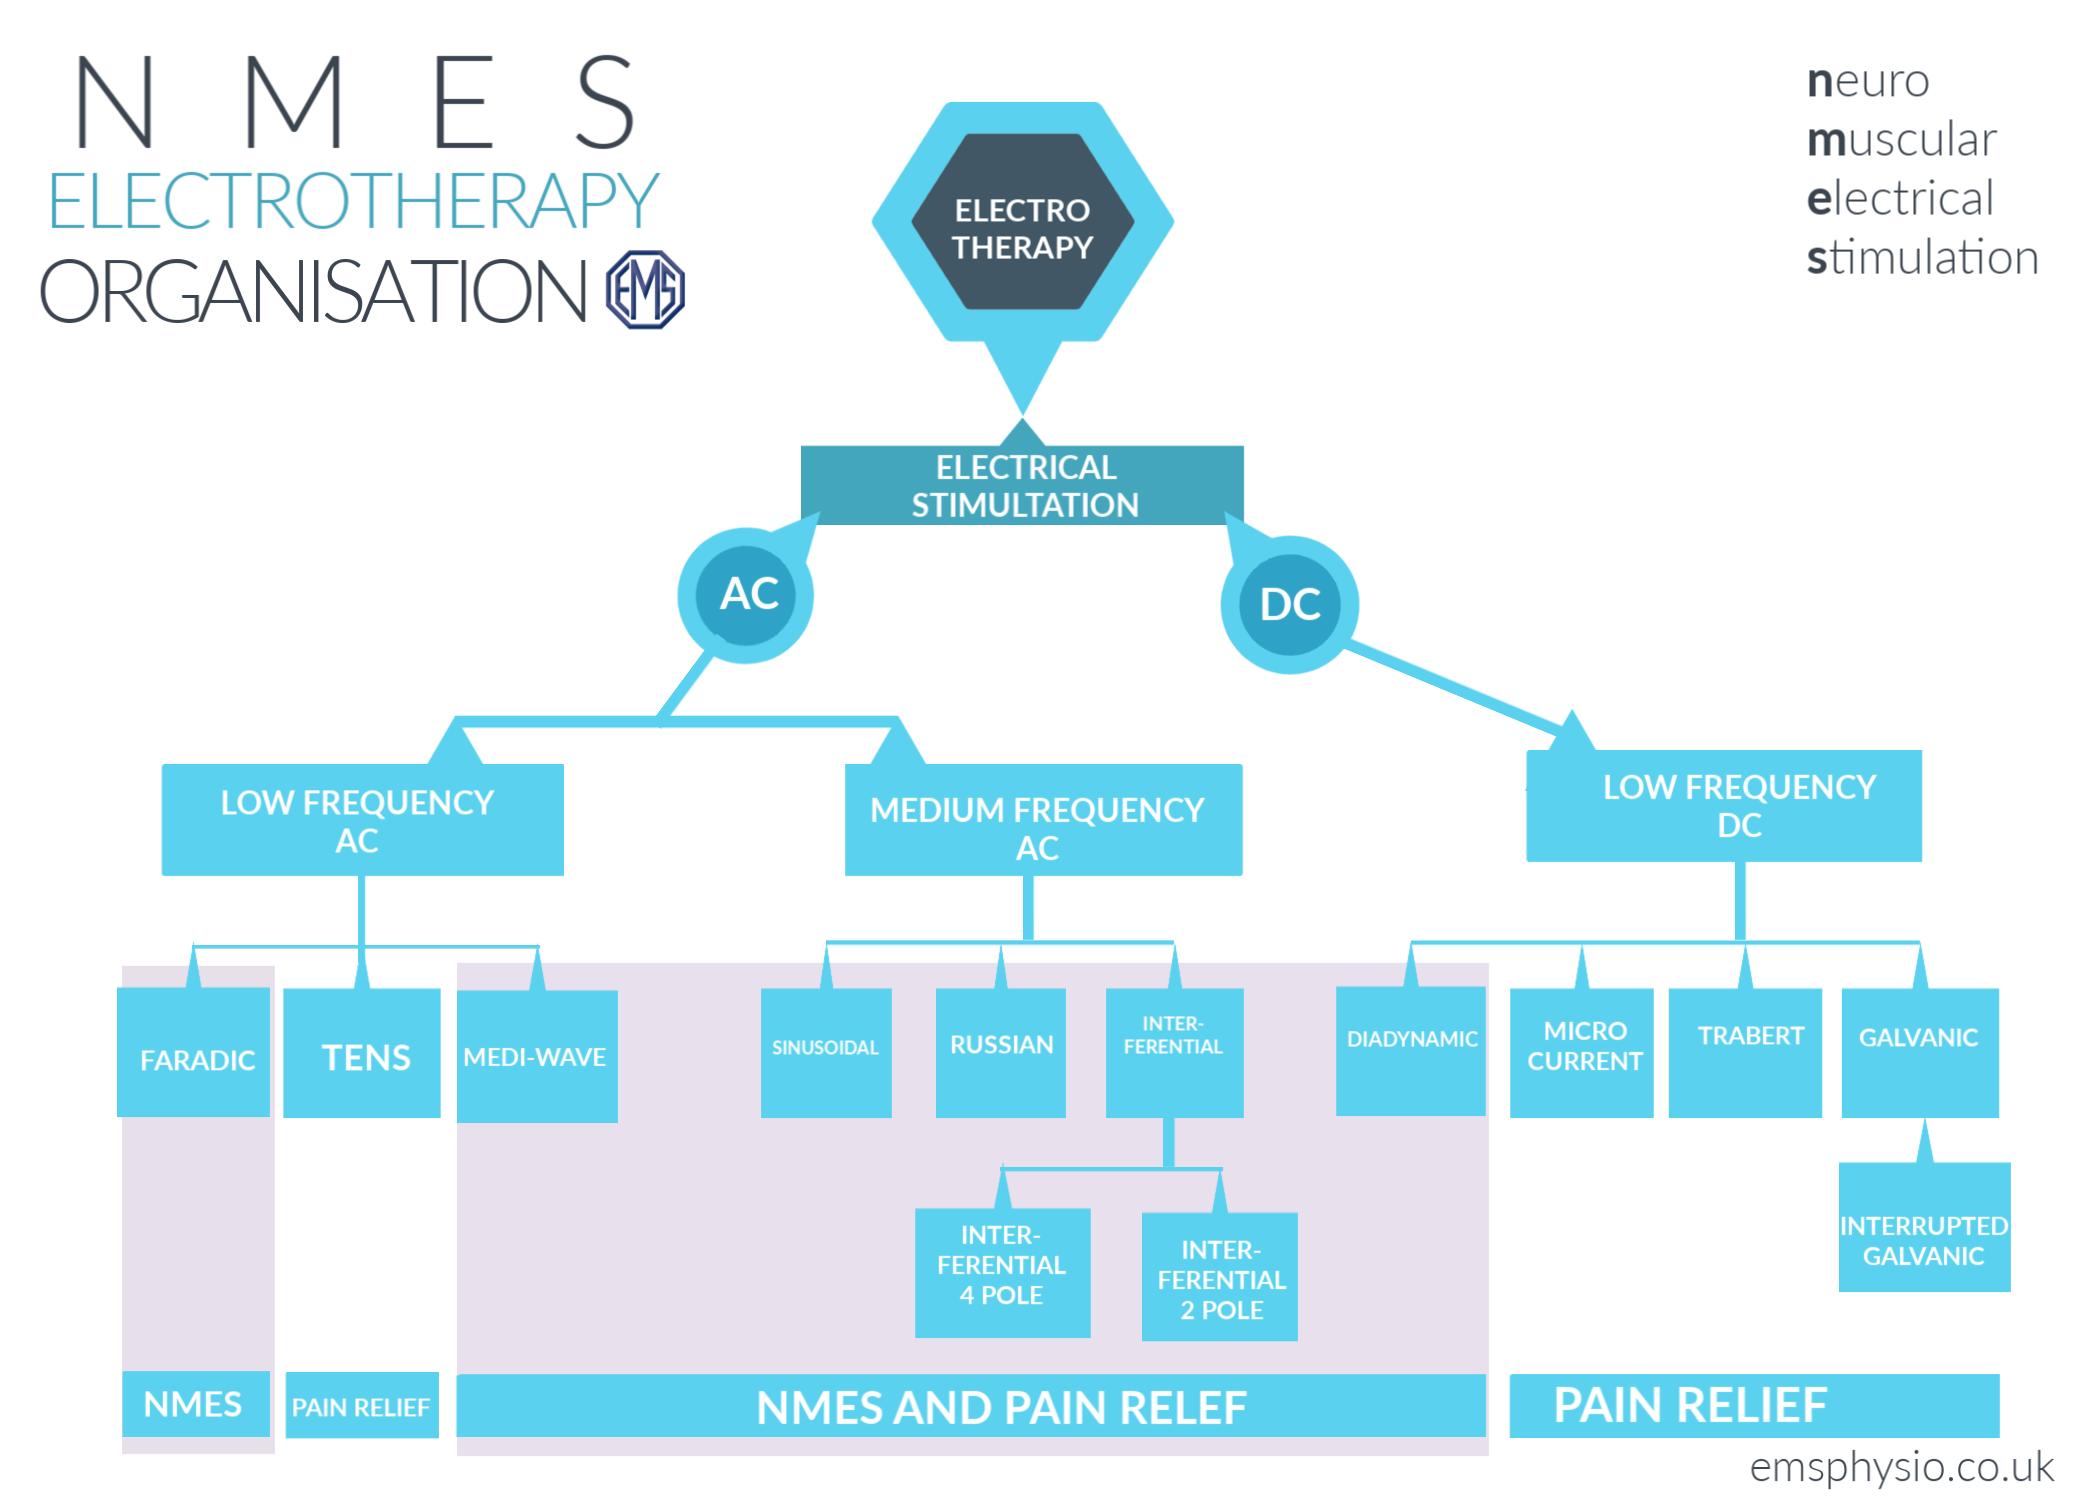 NMES EMS PHYSIO LTD